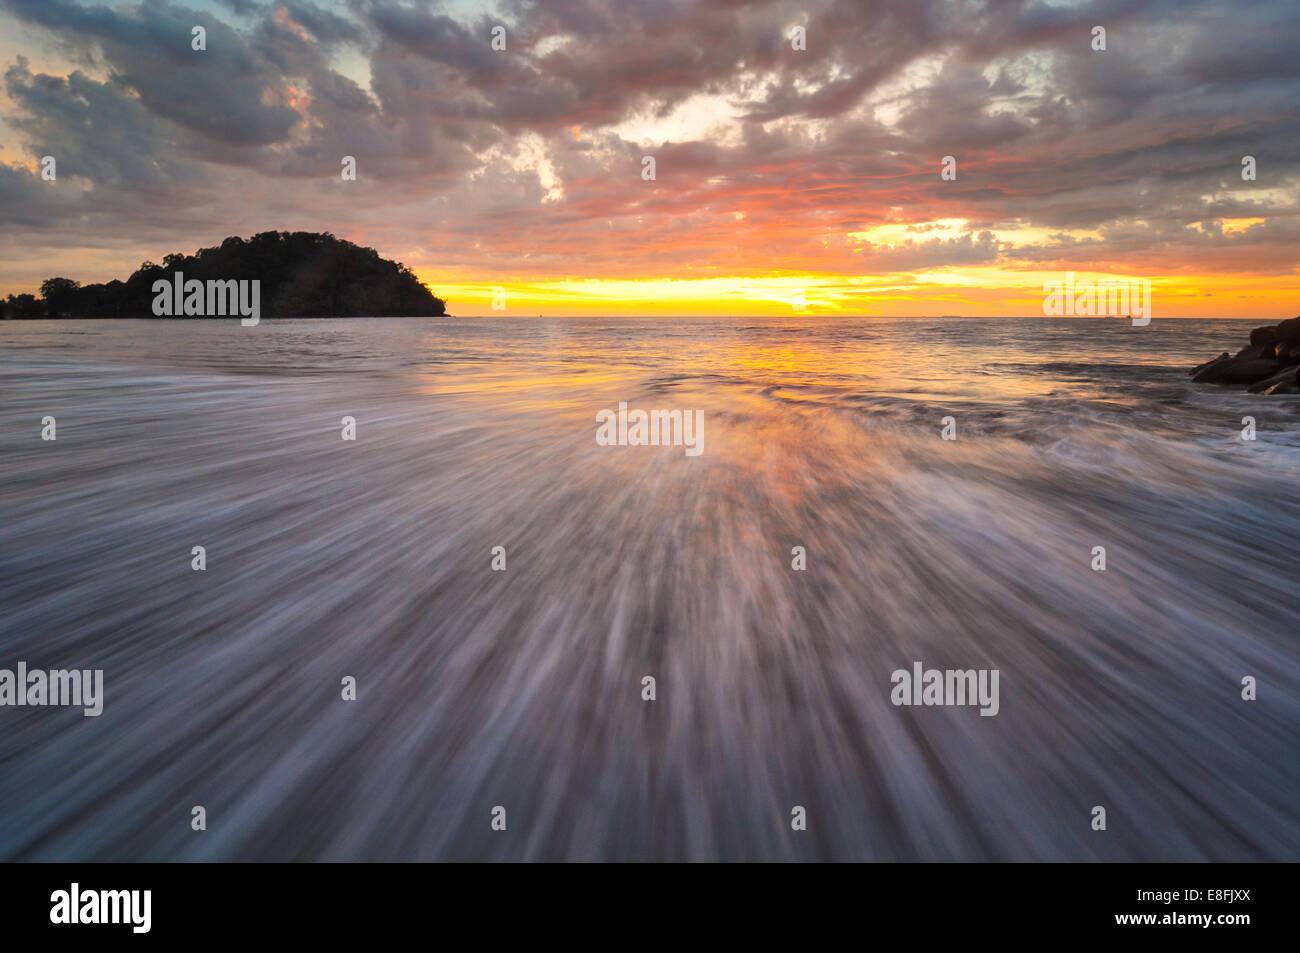 Indonesien, Padang, Taplau Strand, Welle und Sonnenuntergang Stockbild